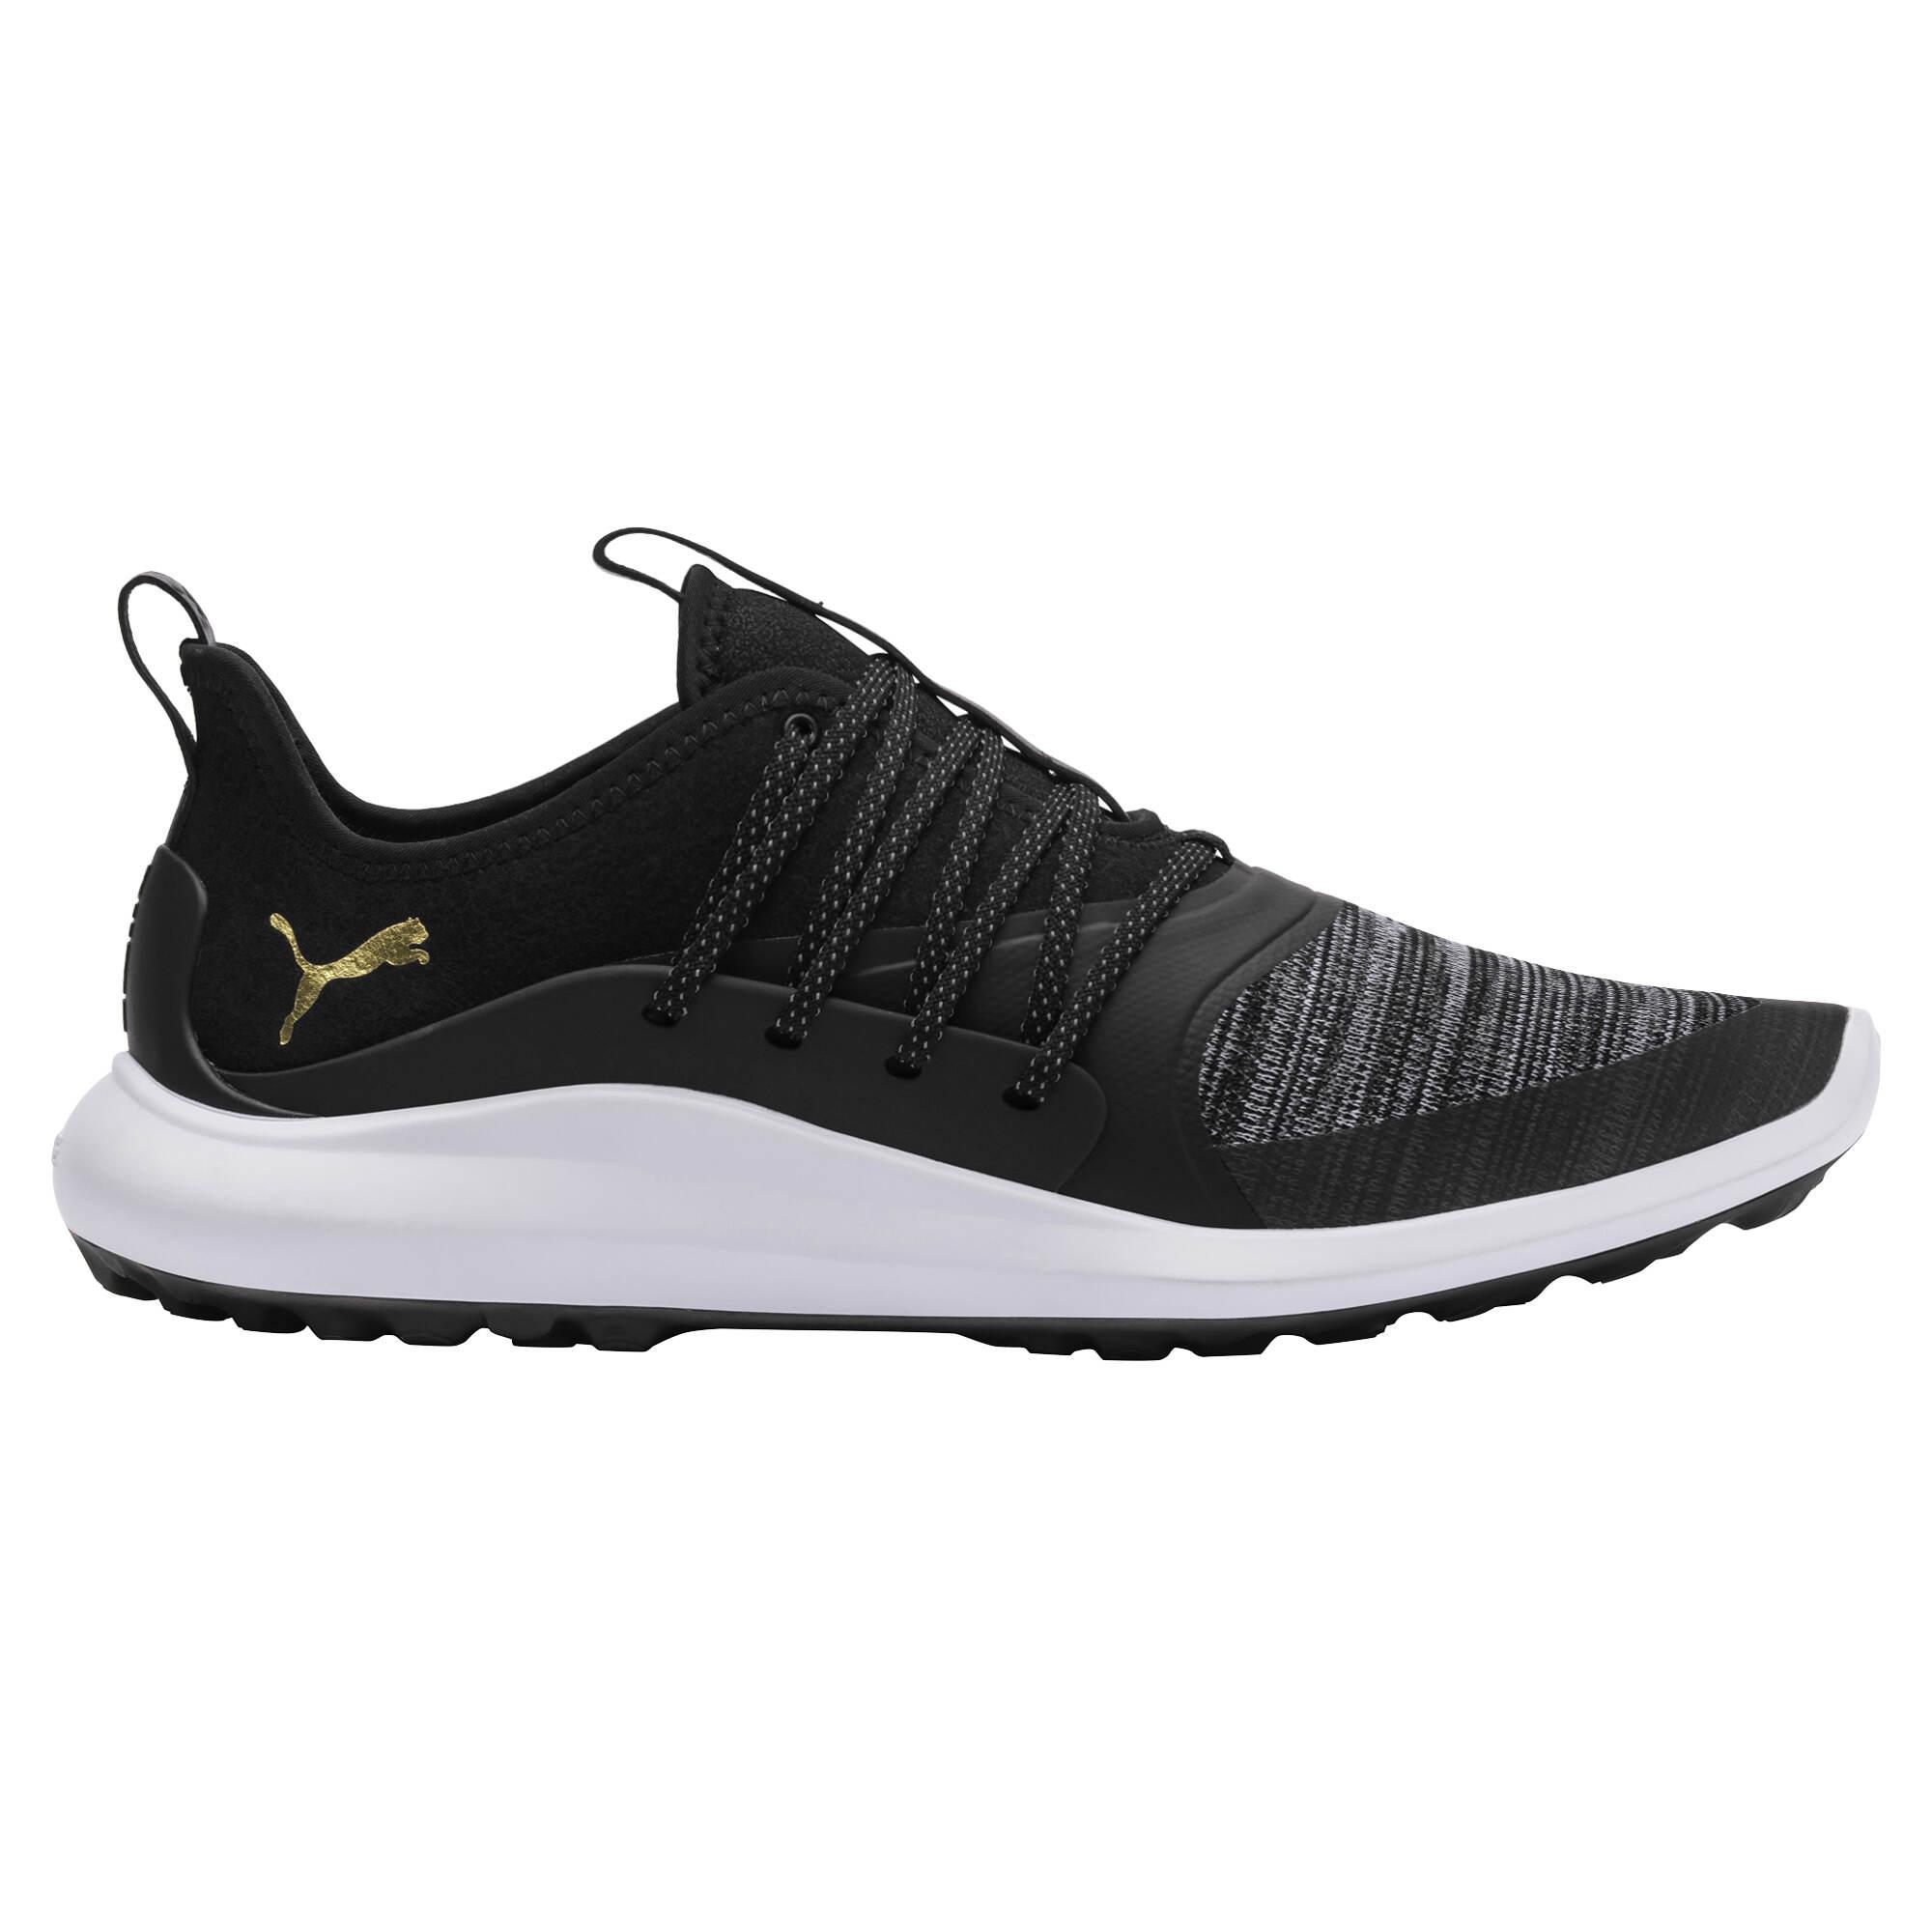 Puma Golf- NXT Solelace Spikeless Shoes